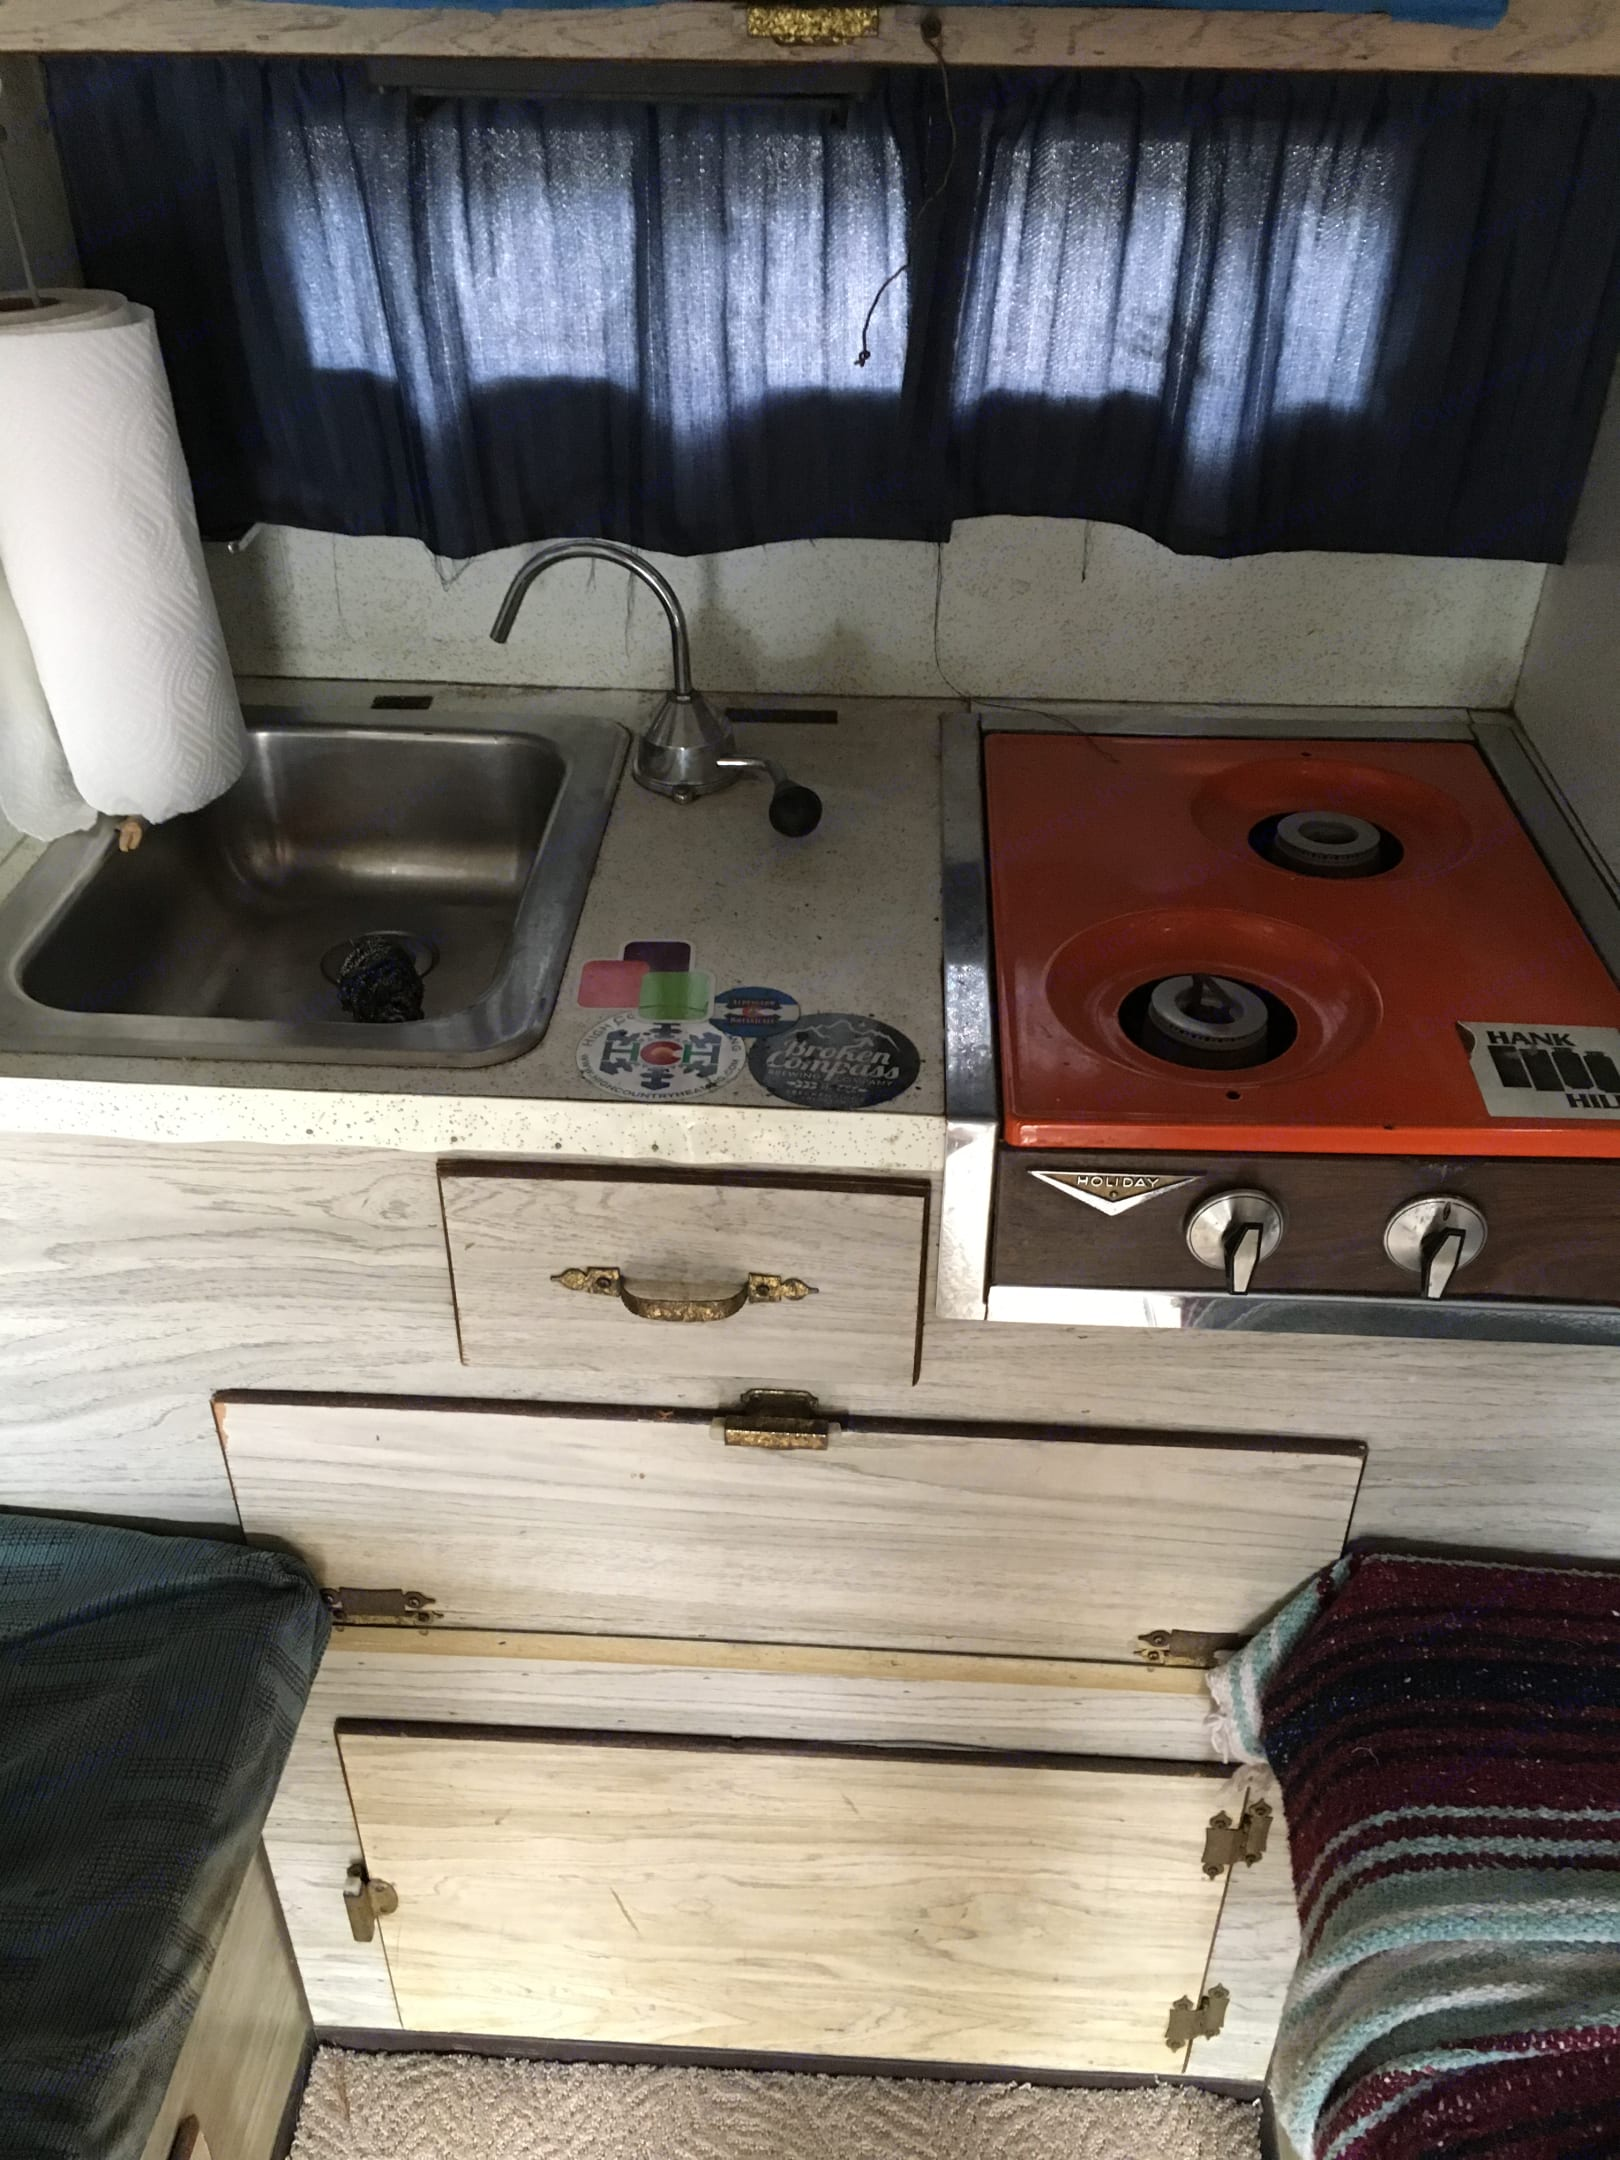 2 burner stove with kitchen sink . mitchell slide in 1997